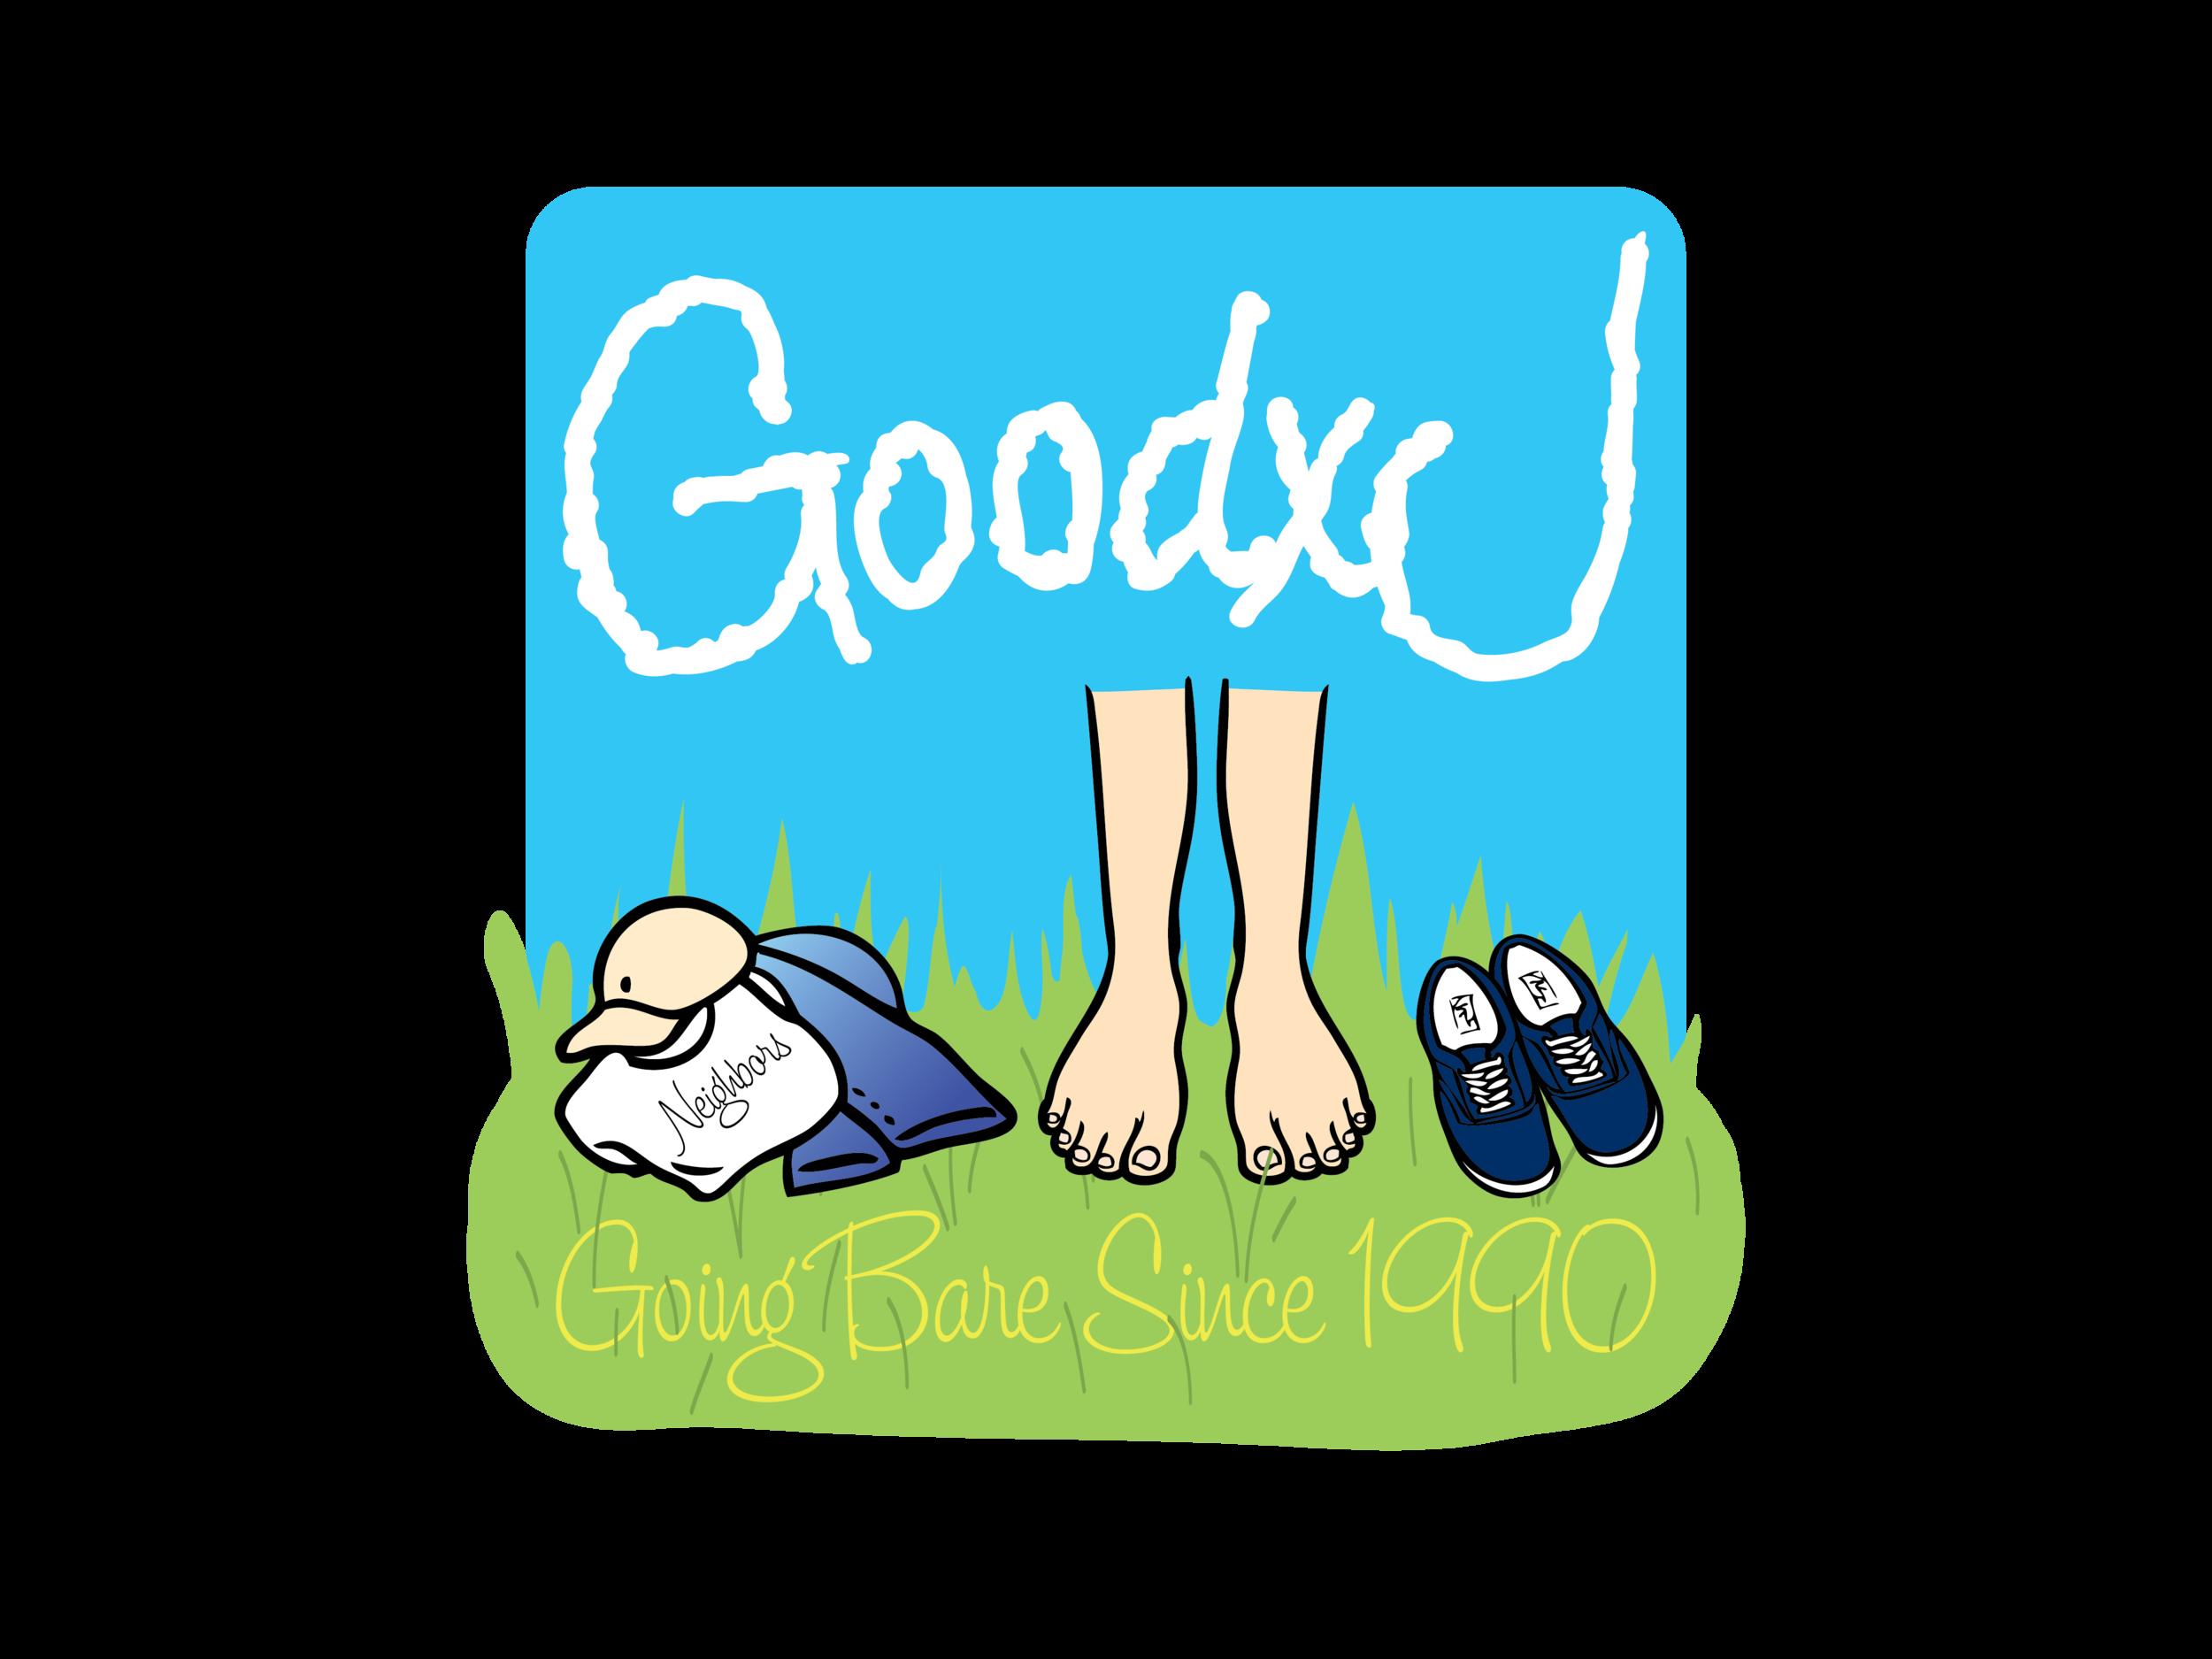 GoodxJ_logo01.png